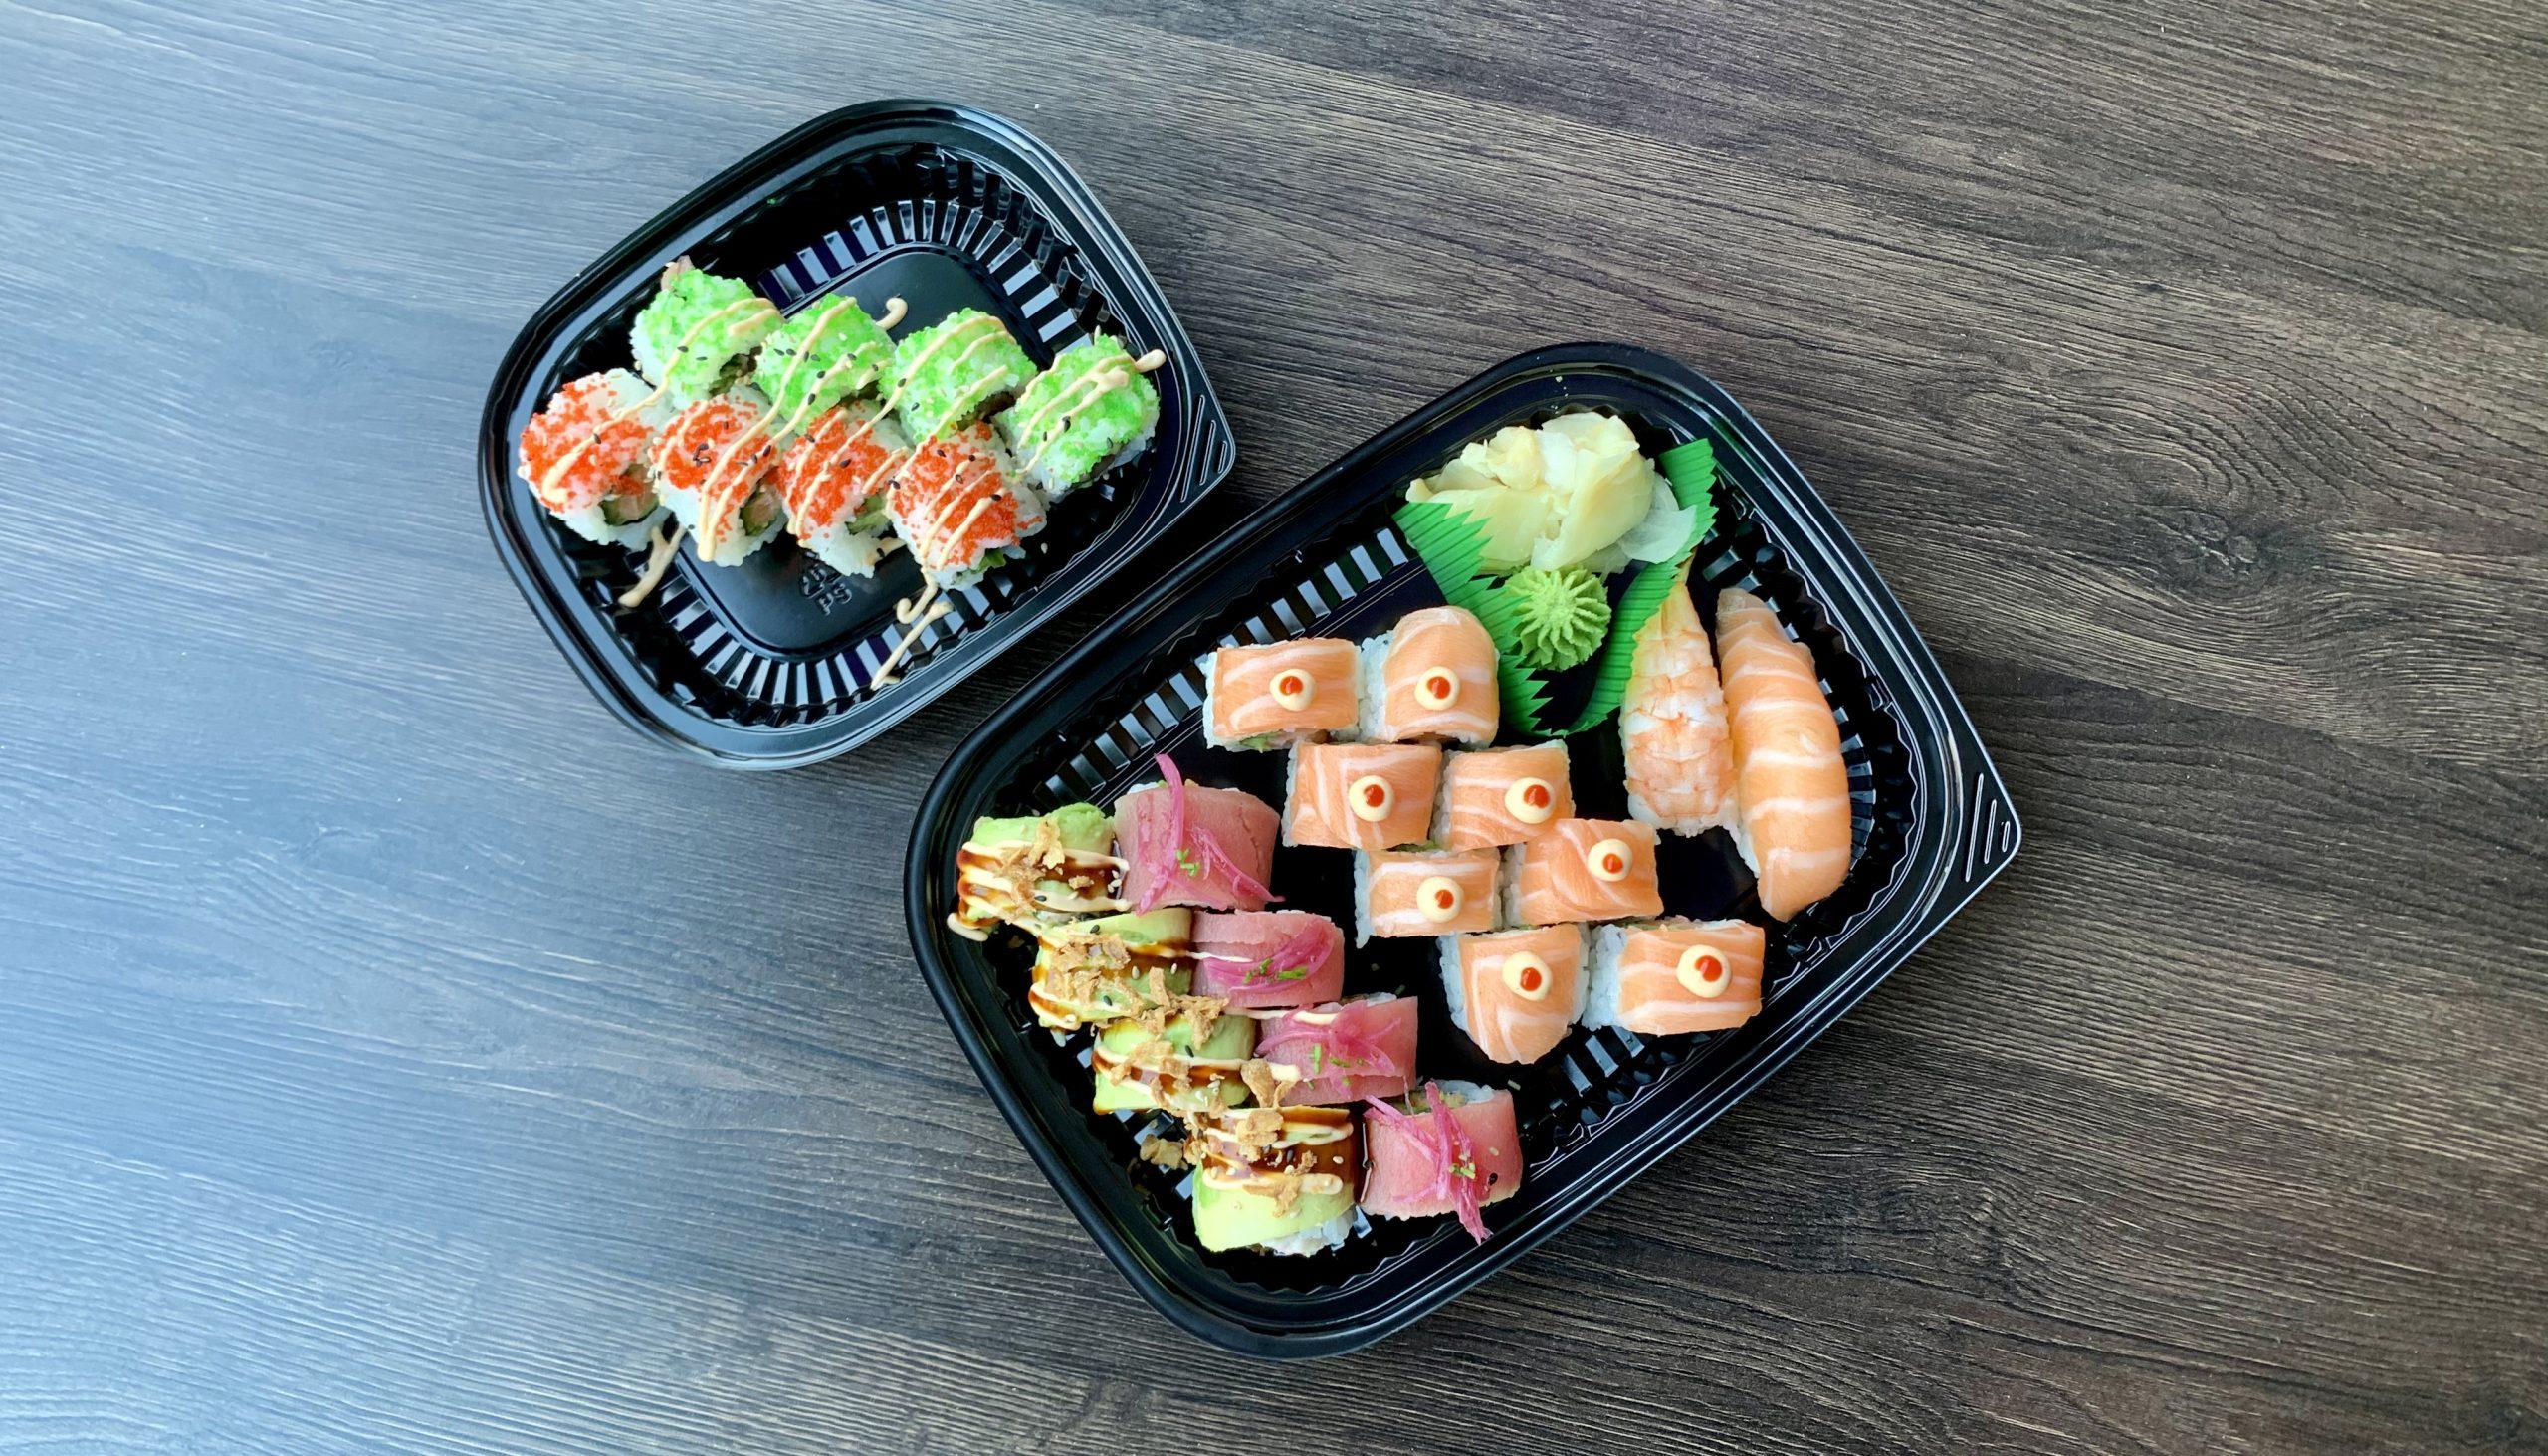 Årets første Aalborg Sushi Festival: Her får du lækre menuer til 115 kr.